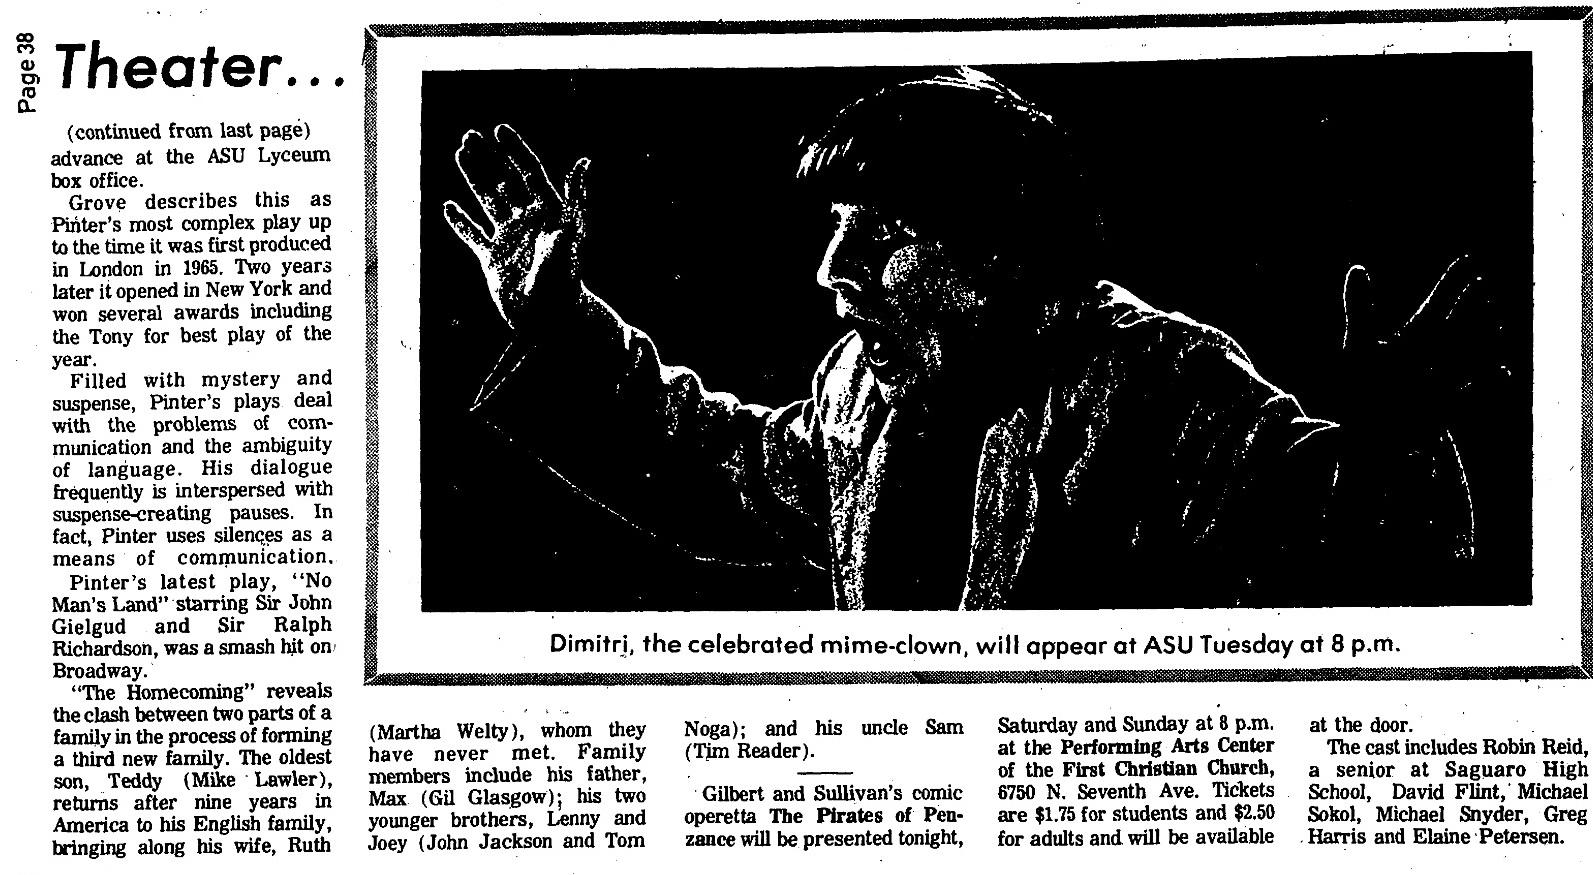 Theater Topics, Nov. 11, 1977b